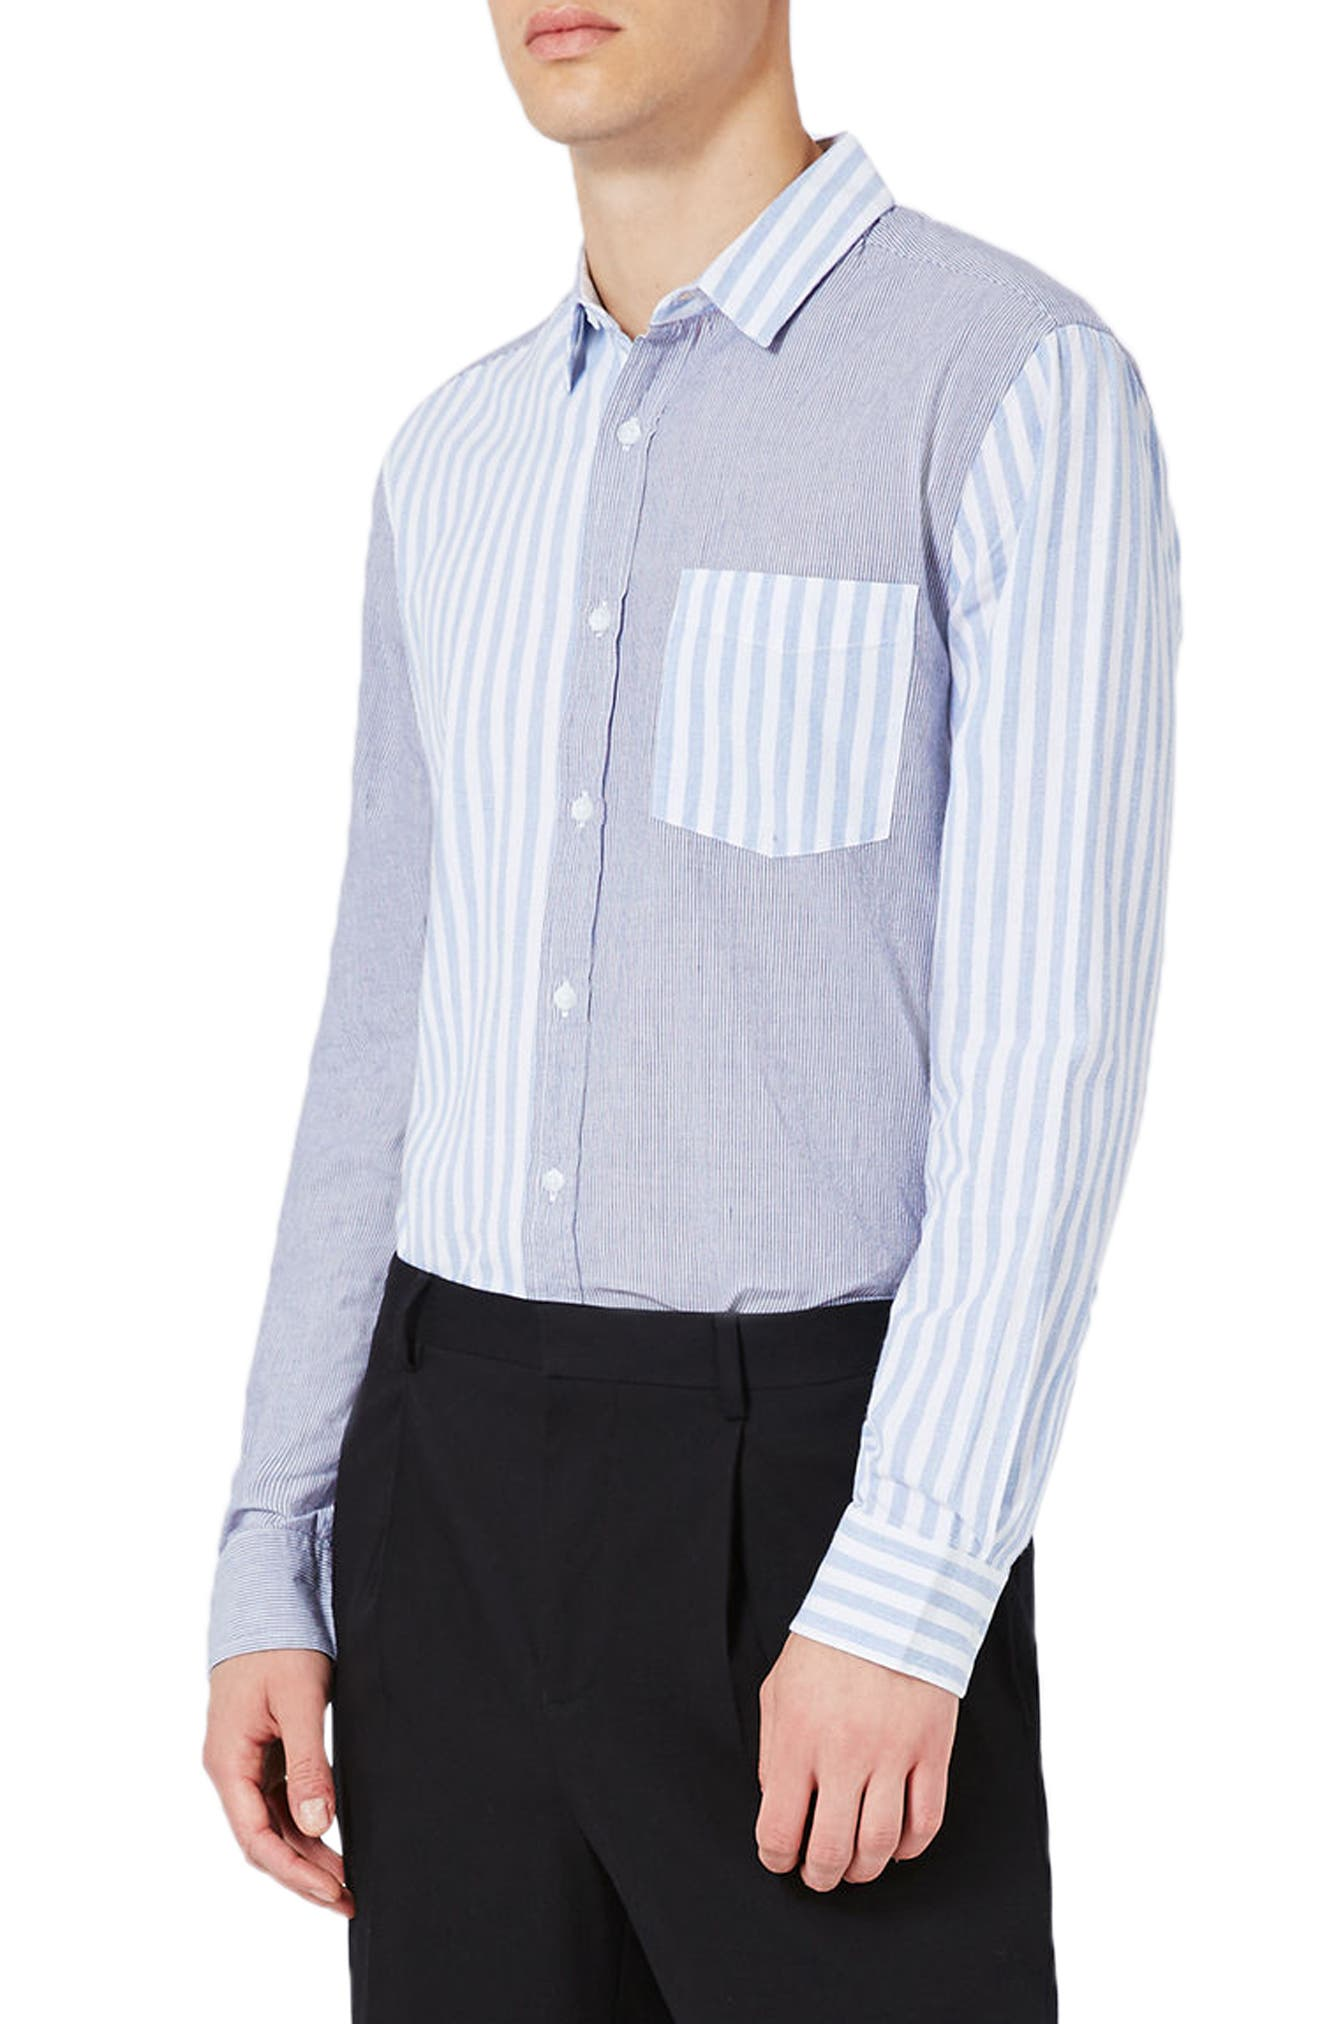 Topshop Mixed Stripe Shirt